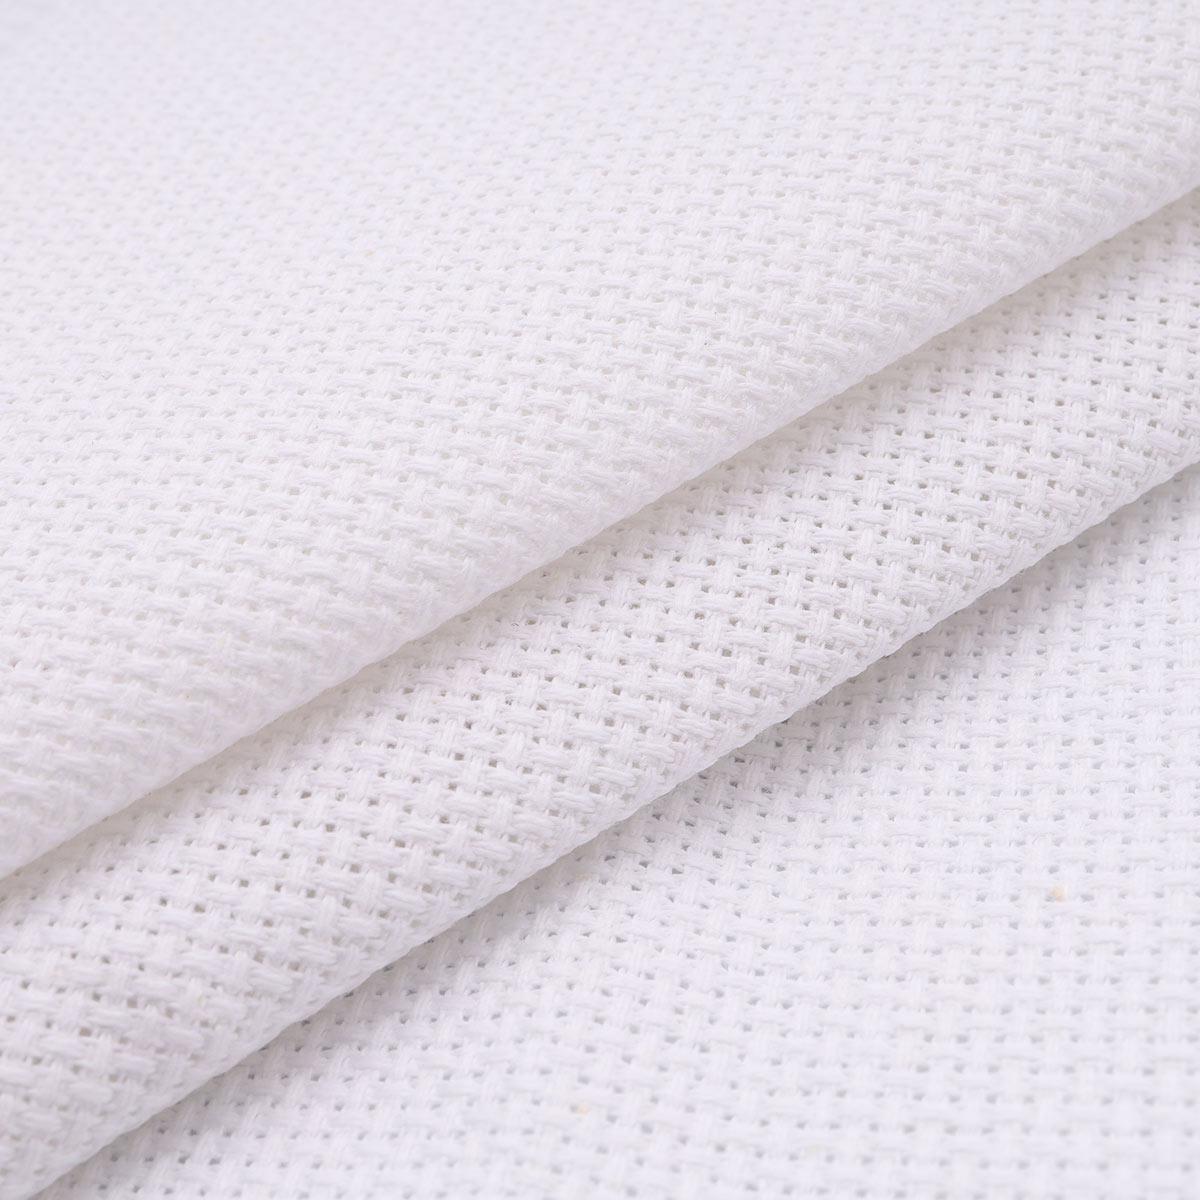 624010 Канва 14C/T, белая, категория B, 150 см*50 м, Bestex